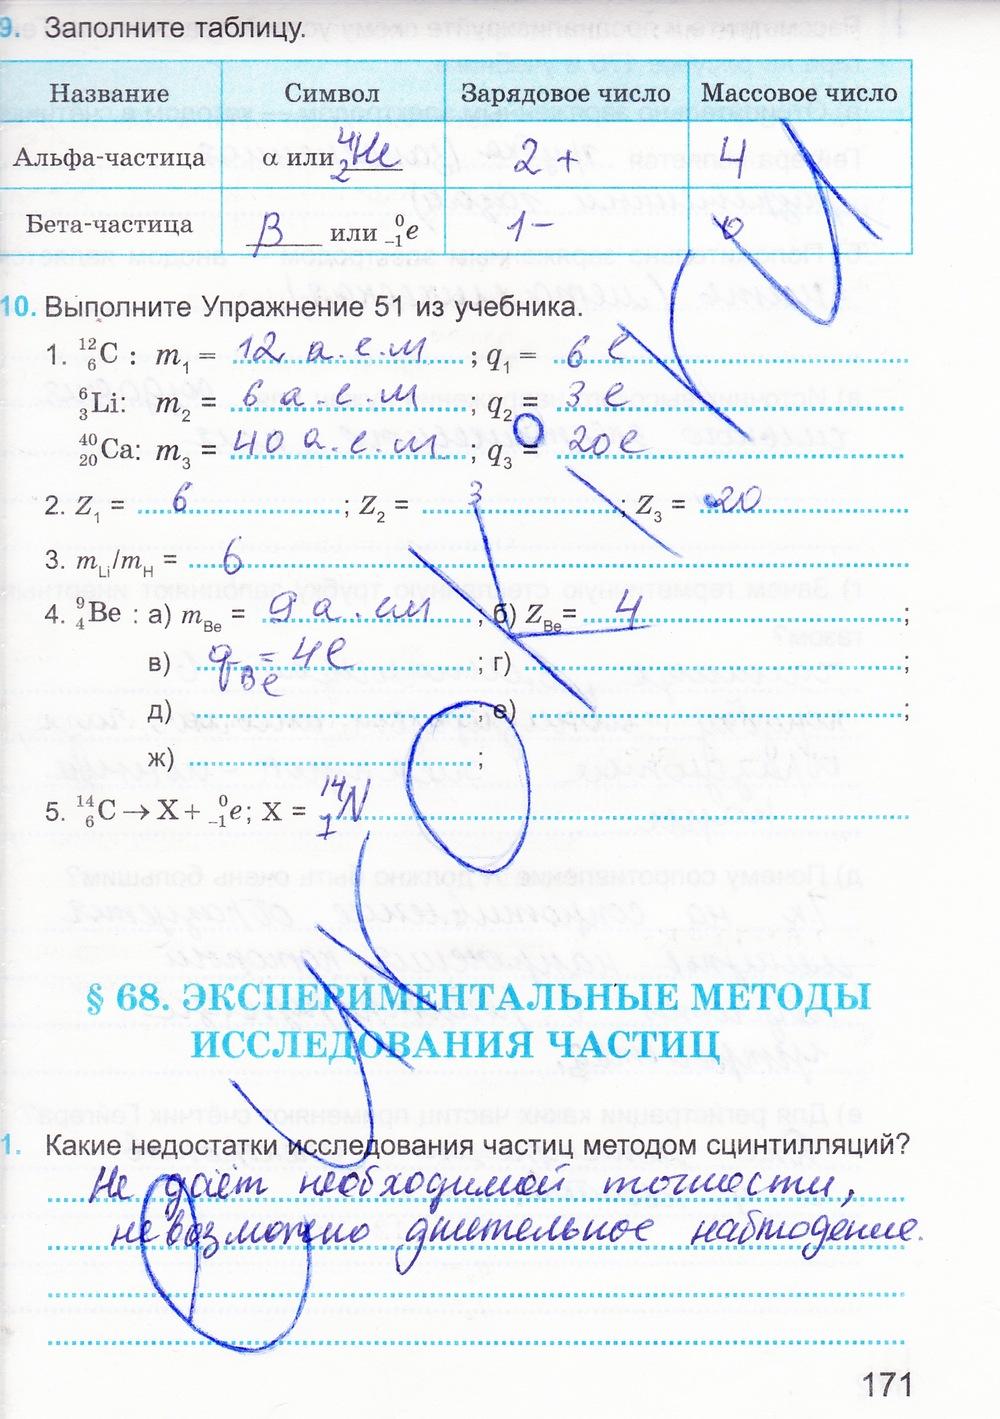 к физики касьянова учебнику решебник